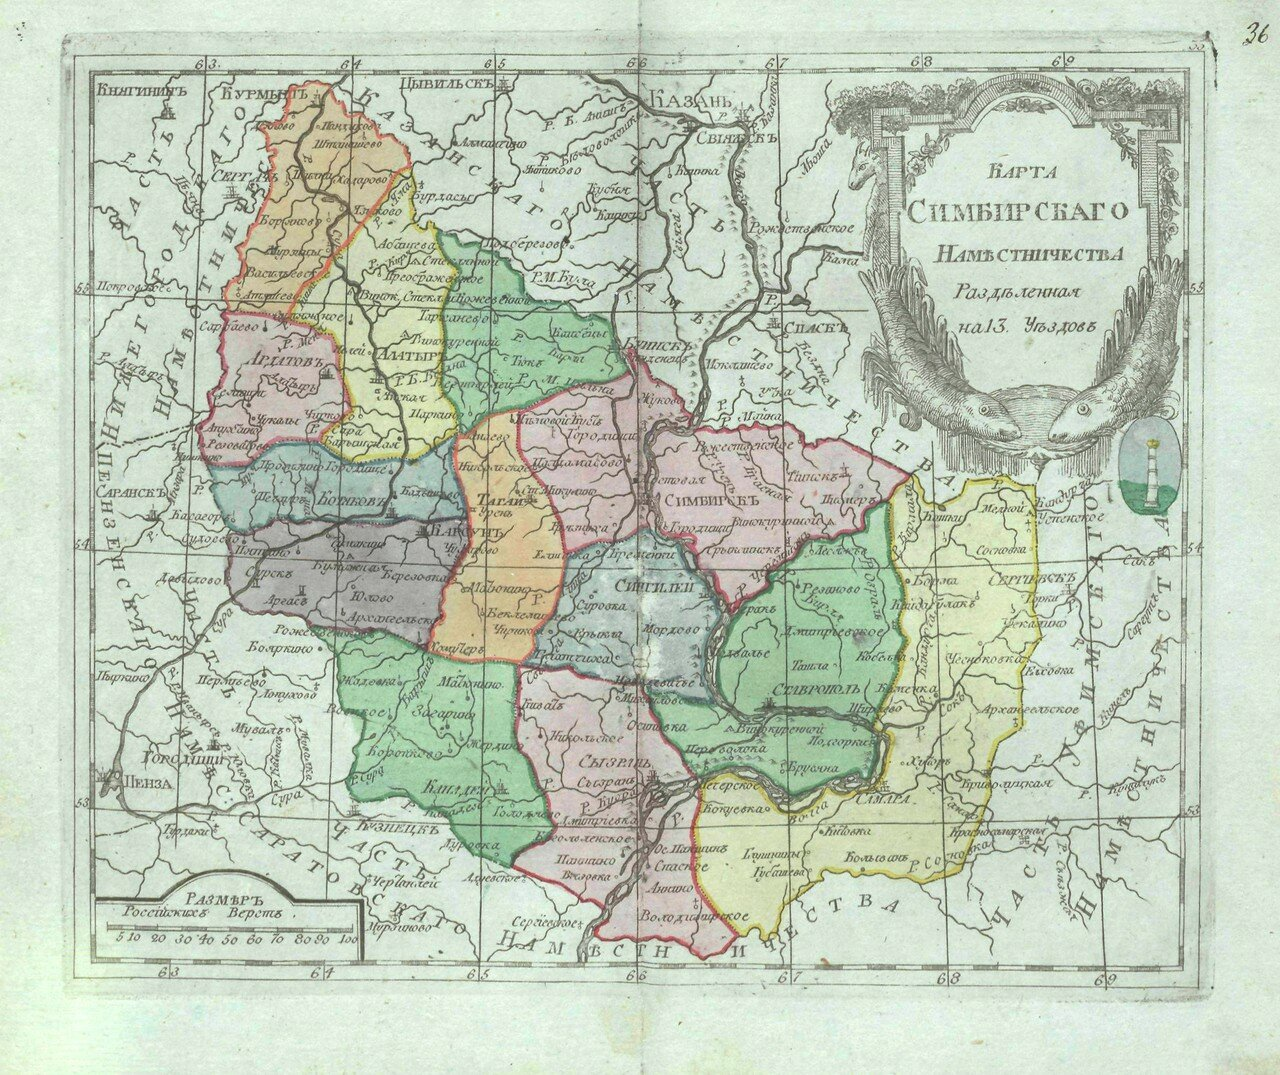 38. Карта Симбирского наместничества